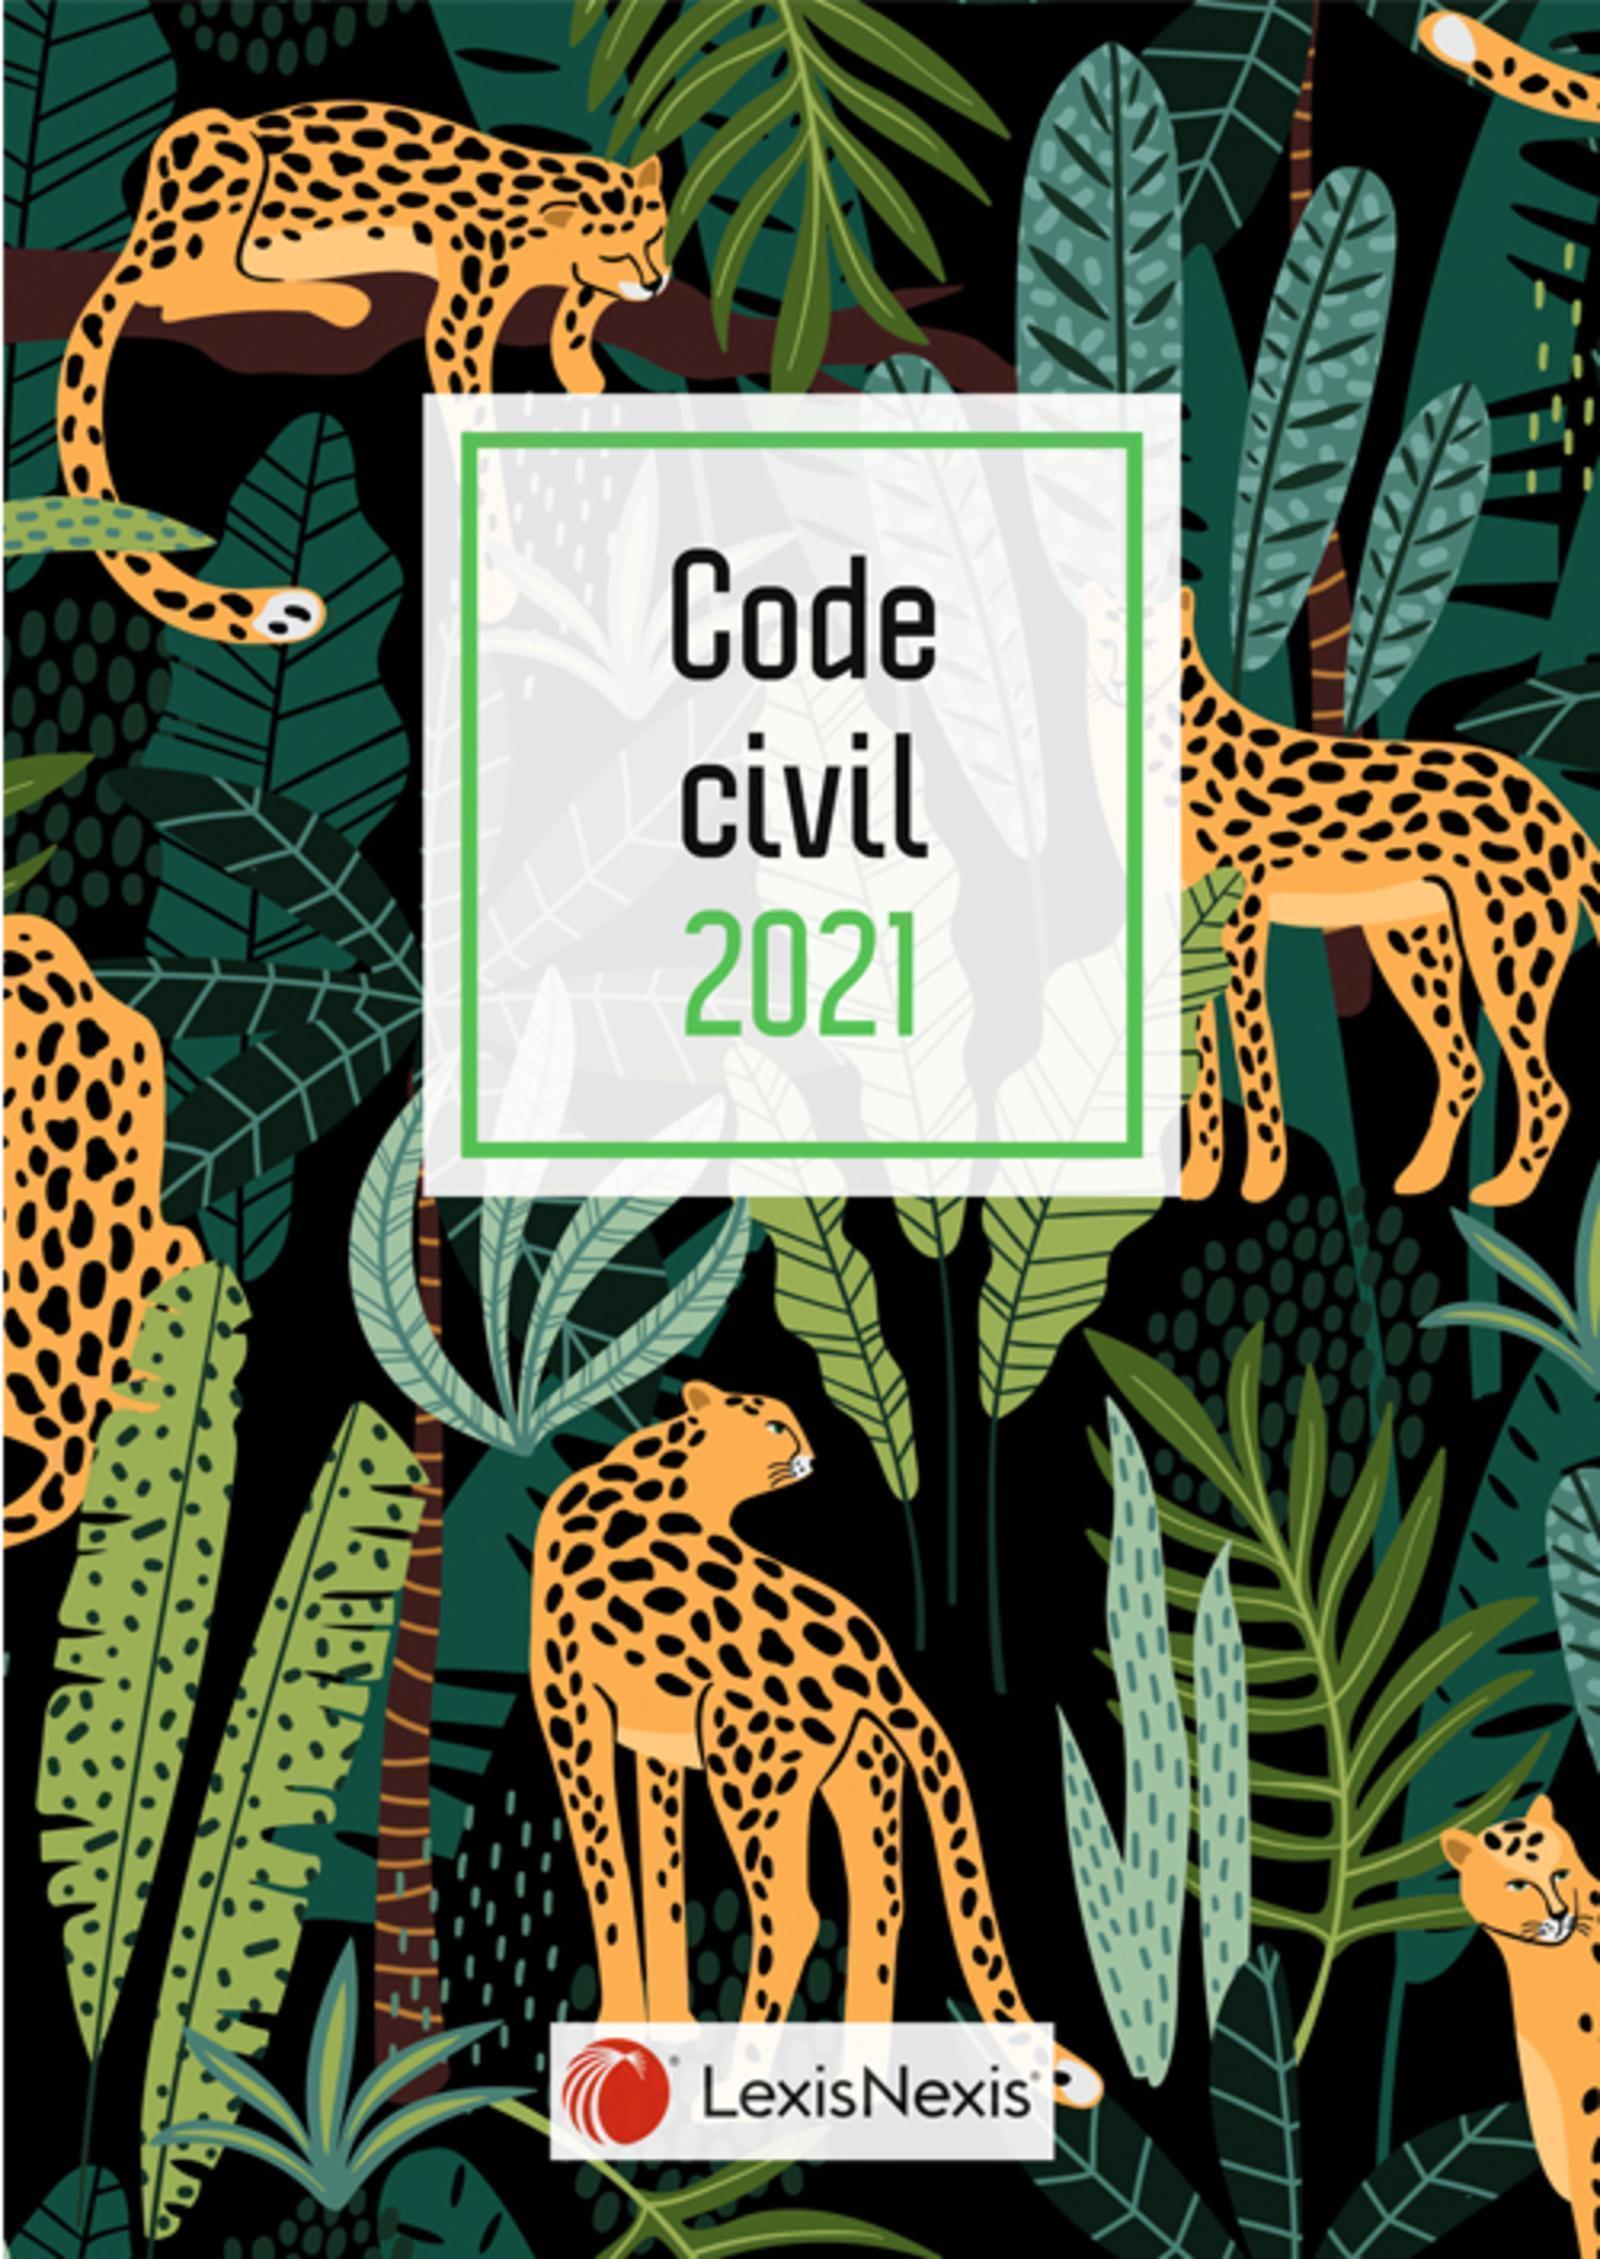 CODE CIVIL 2021 - JAQUETTE 4